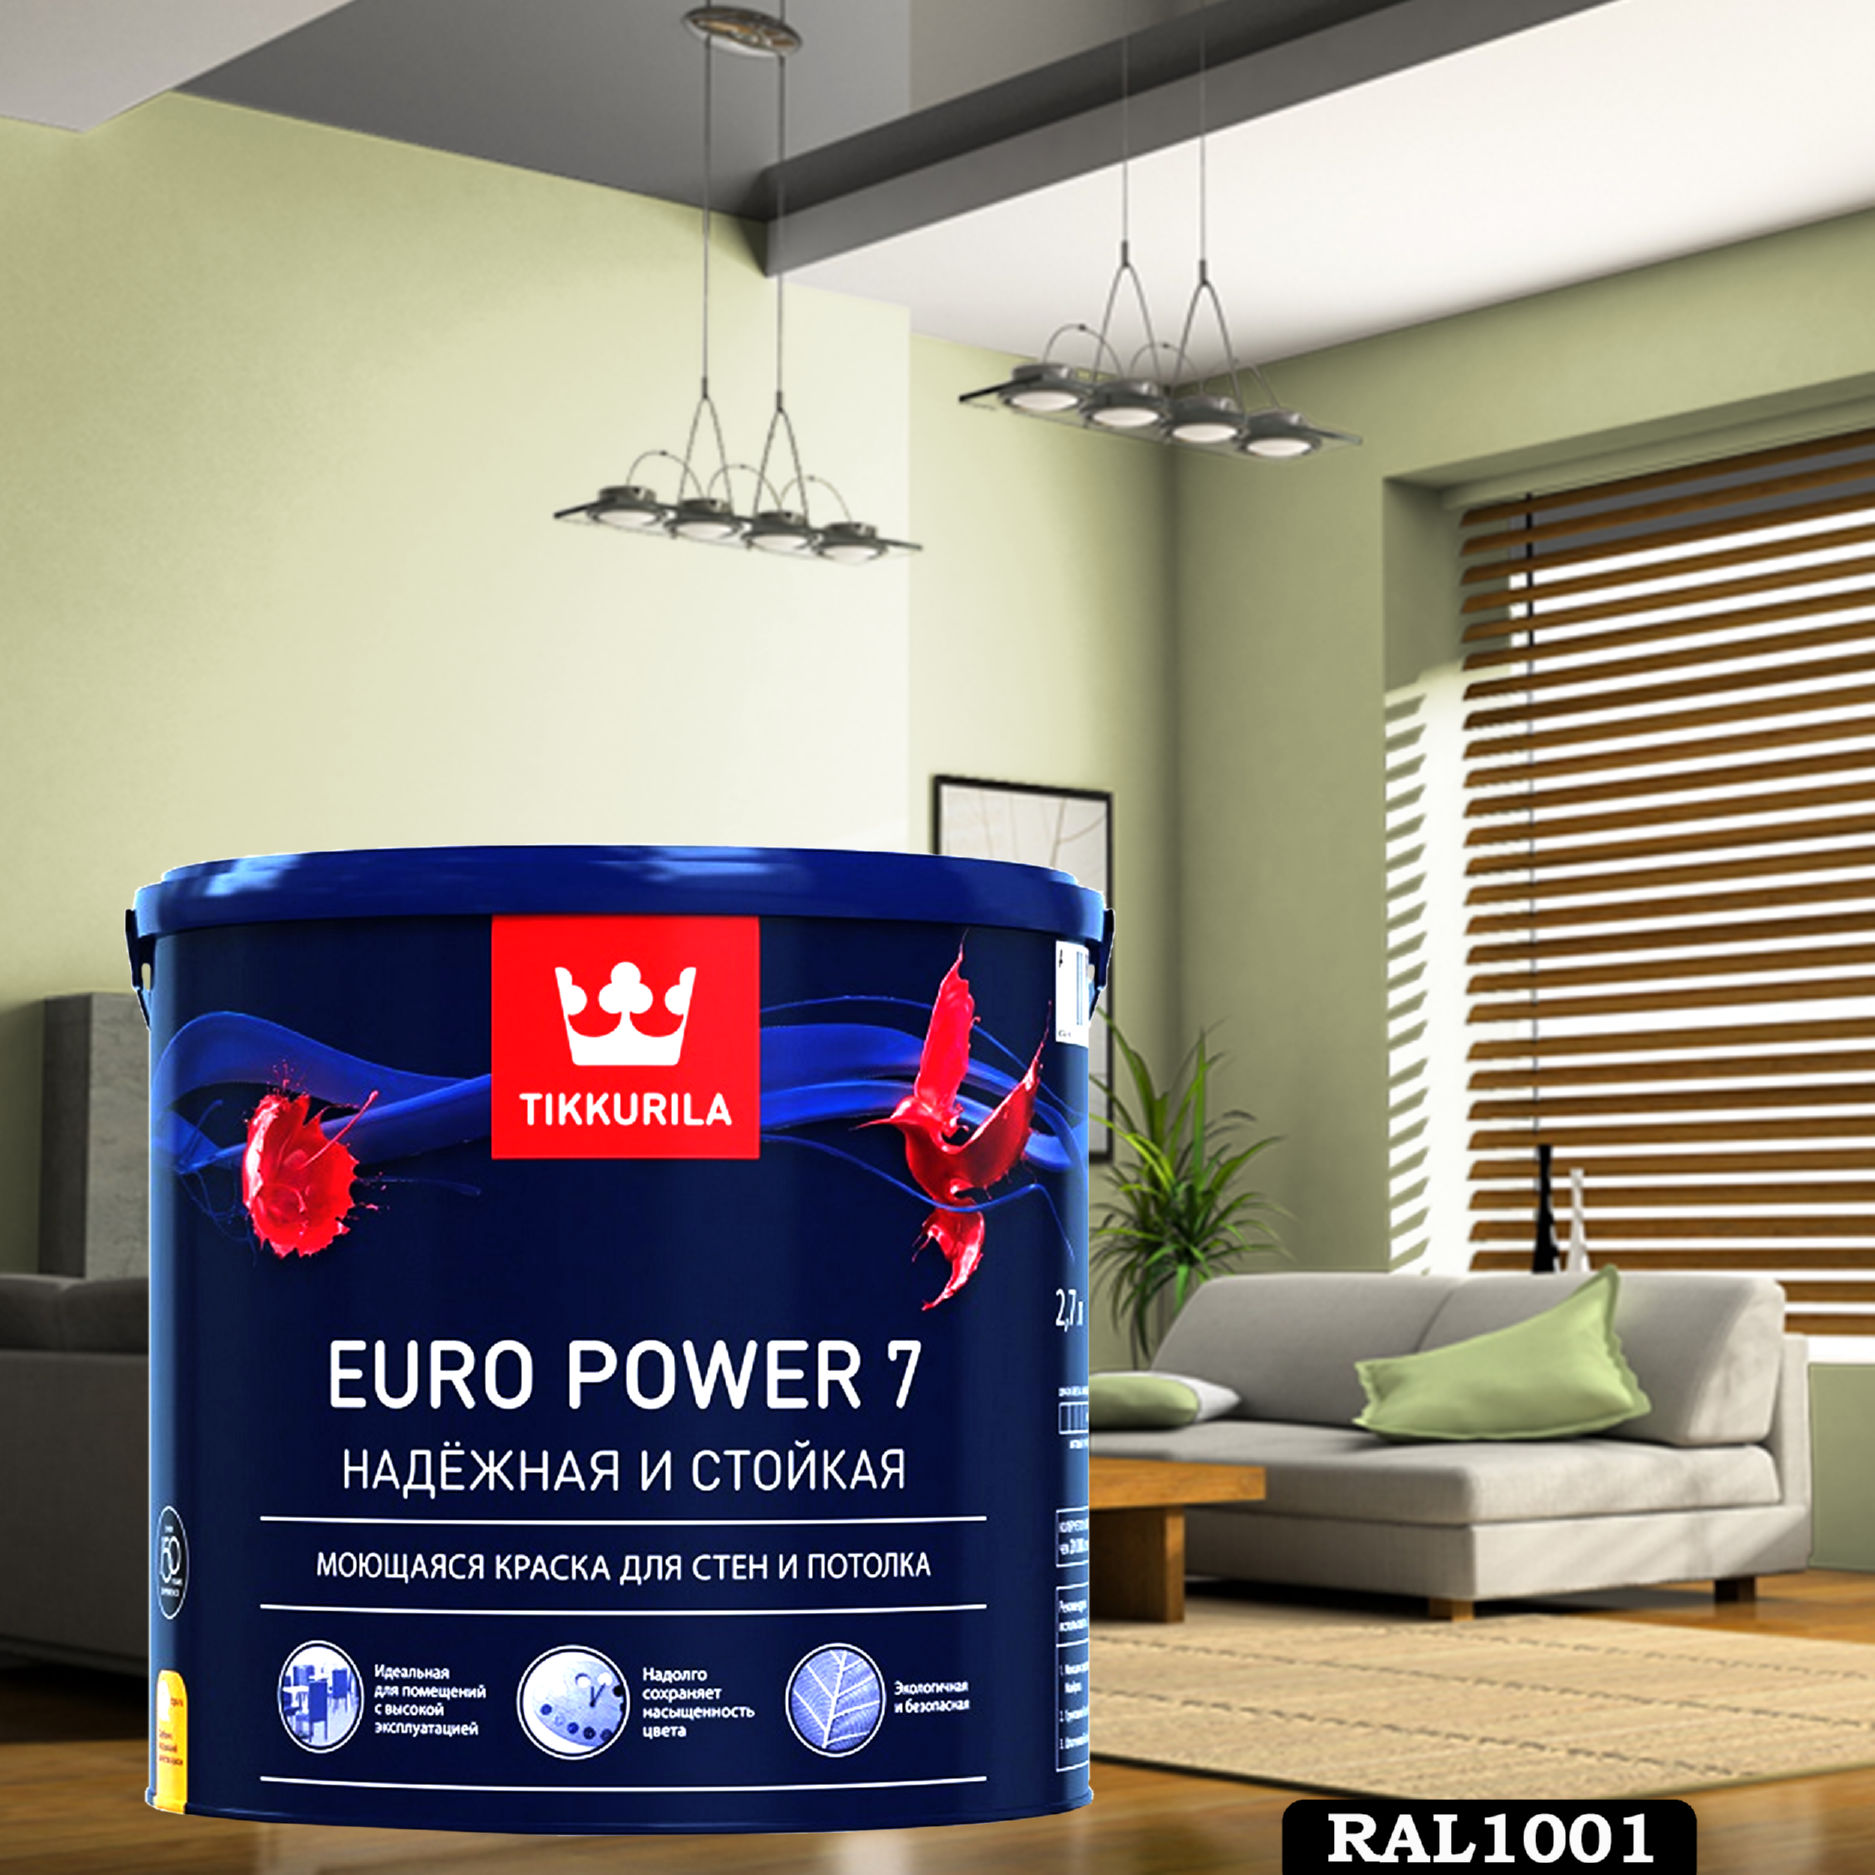 Фото 2 - Краска TIKKURILA Euro Power 7,  RAL 1001 Бежевый, латексная моющаяся матовая интерьерная, 9 л.